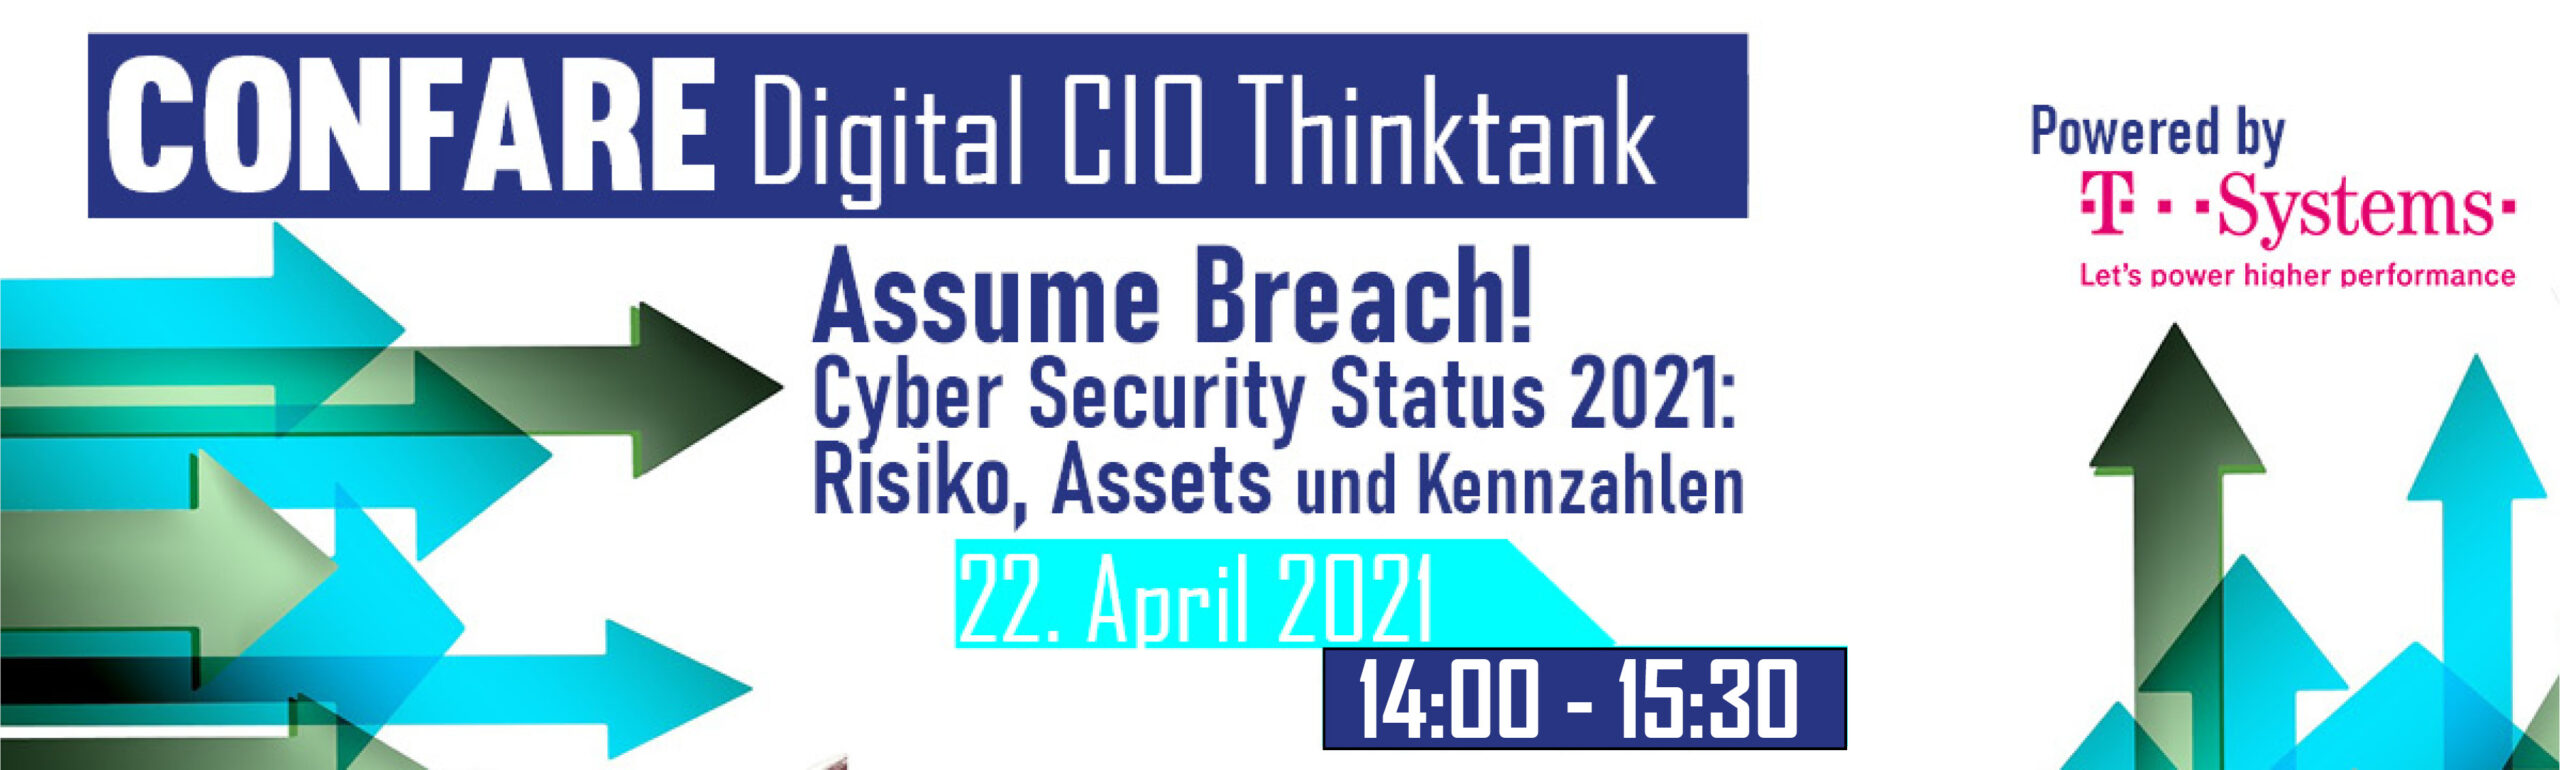 T-Systems: Assume Breach! Cyber Security Status 2021: Risiko, Assets und Kennzahlen